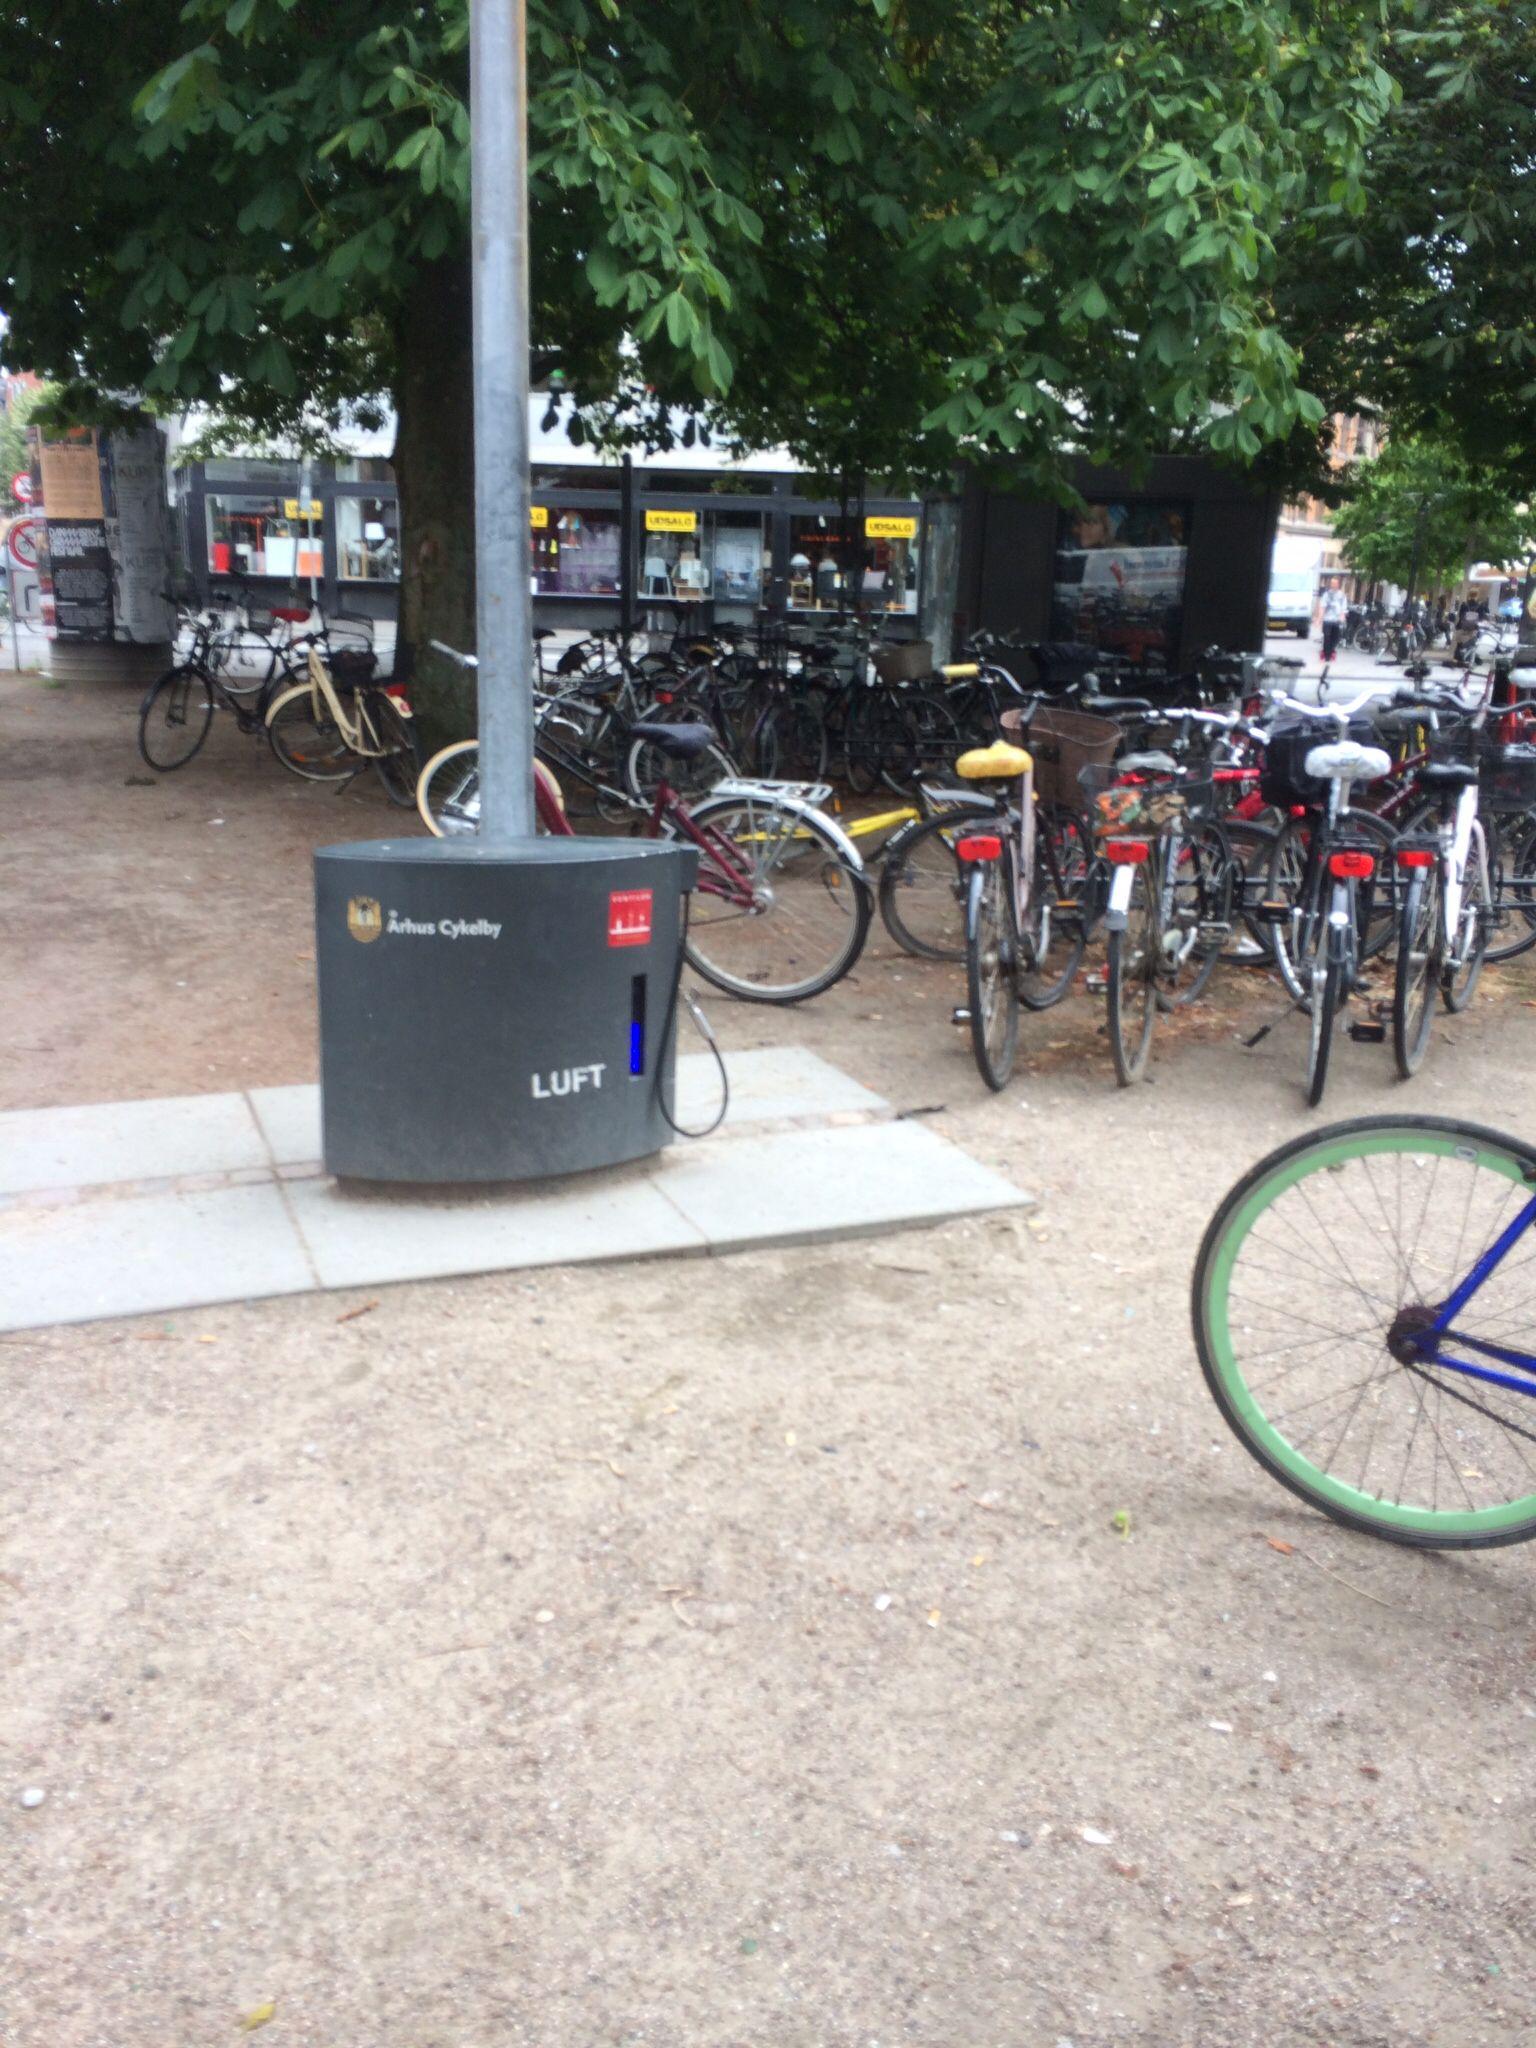 Free air pump by bike racks